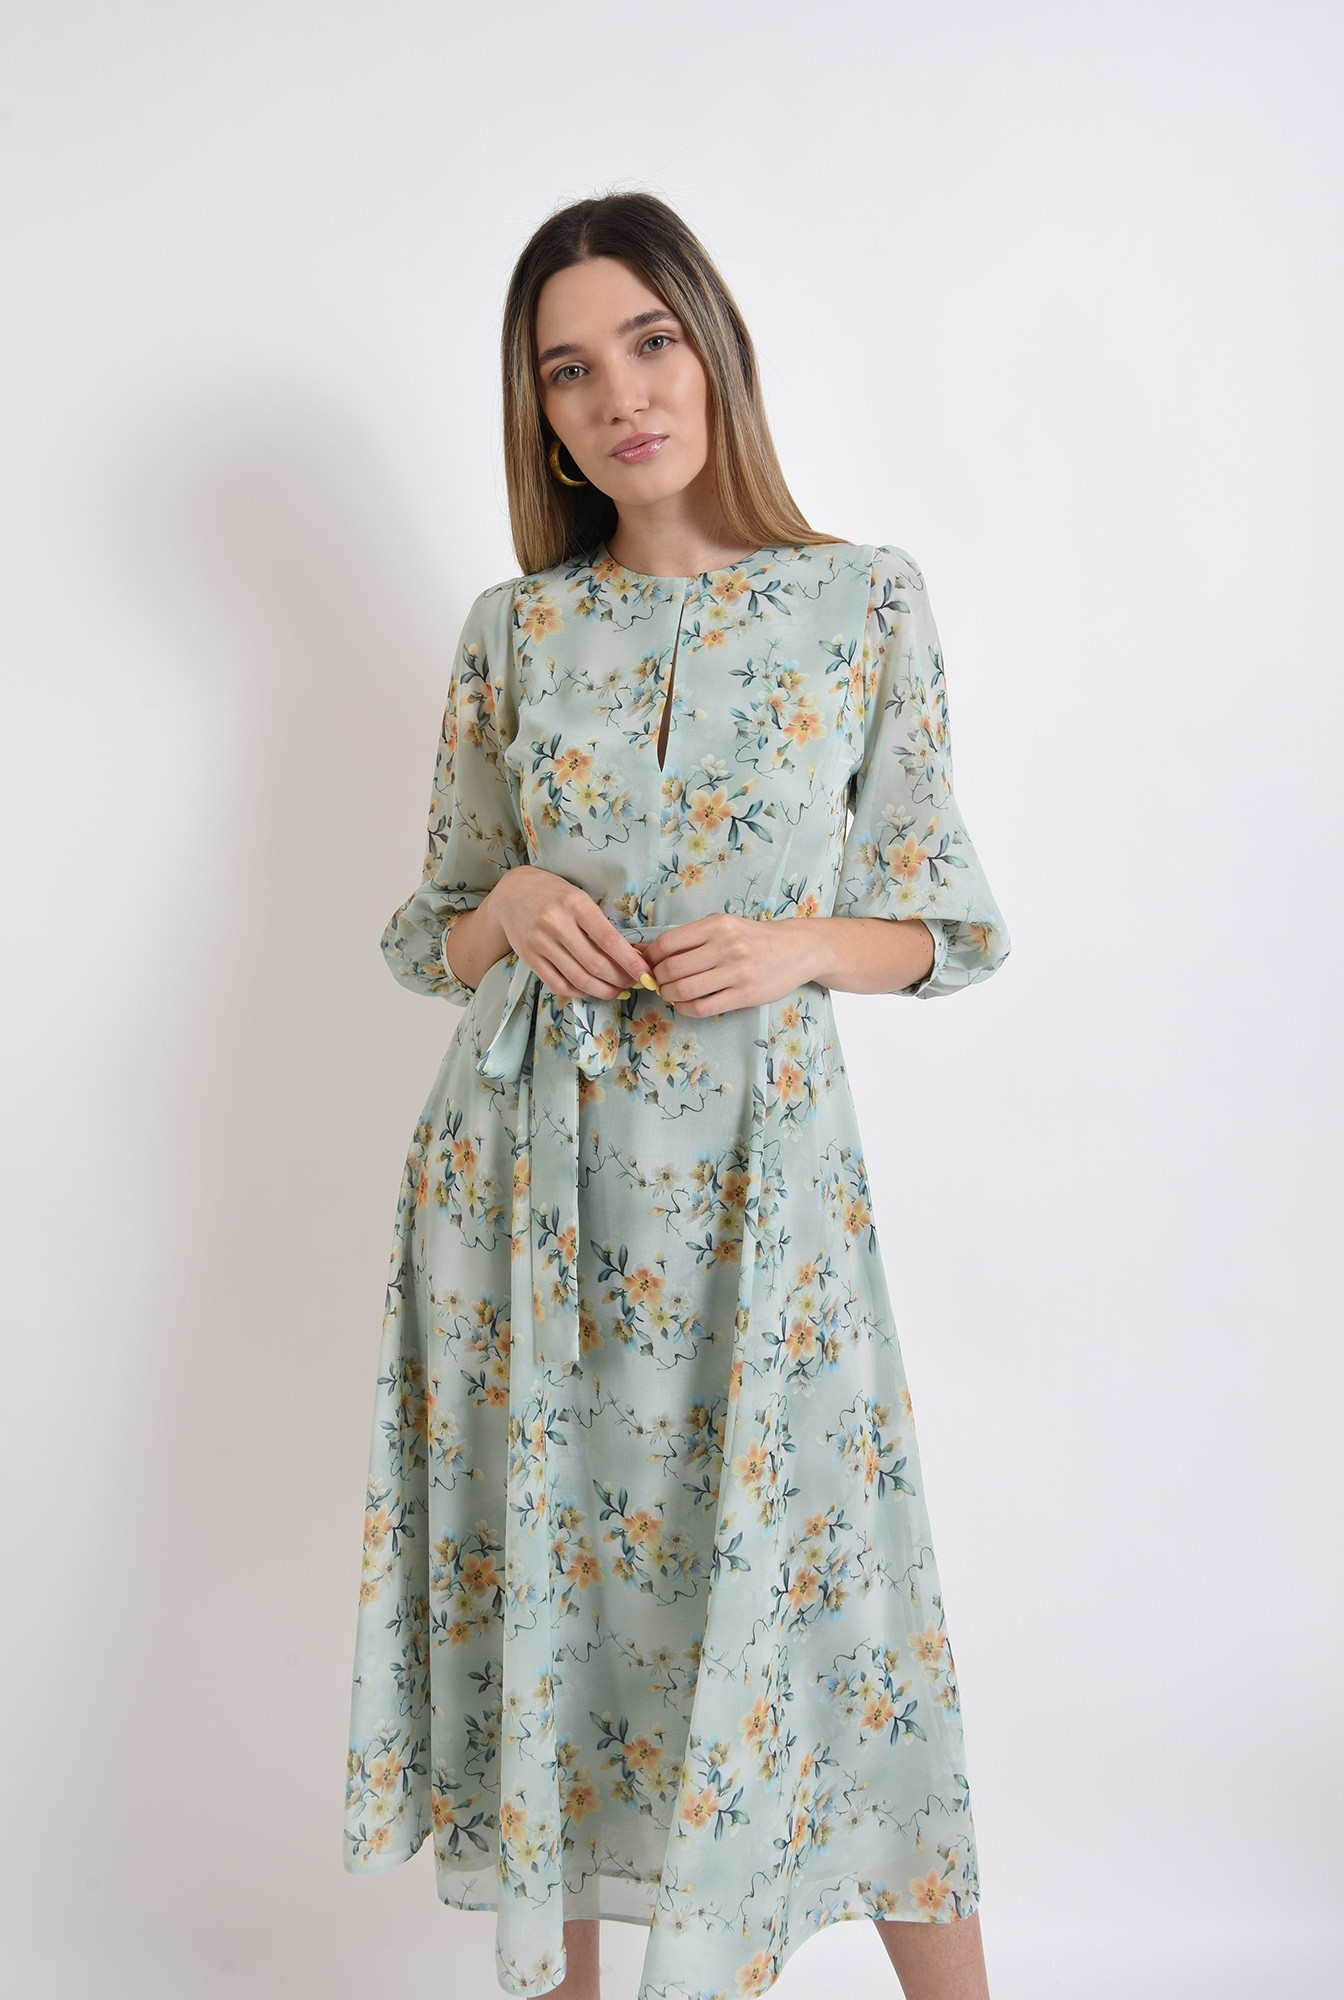 0 - rochie eleganta, verde, pastel, cu flori, poema, evazata